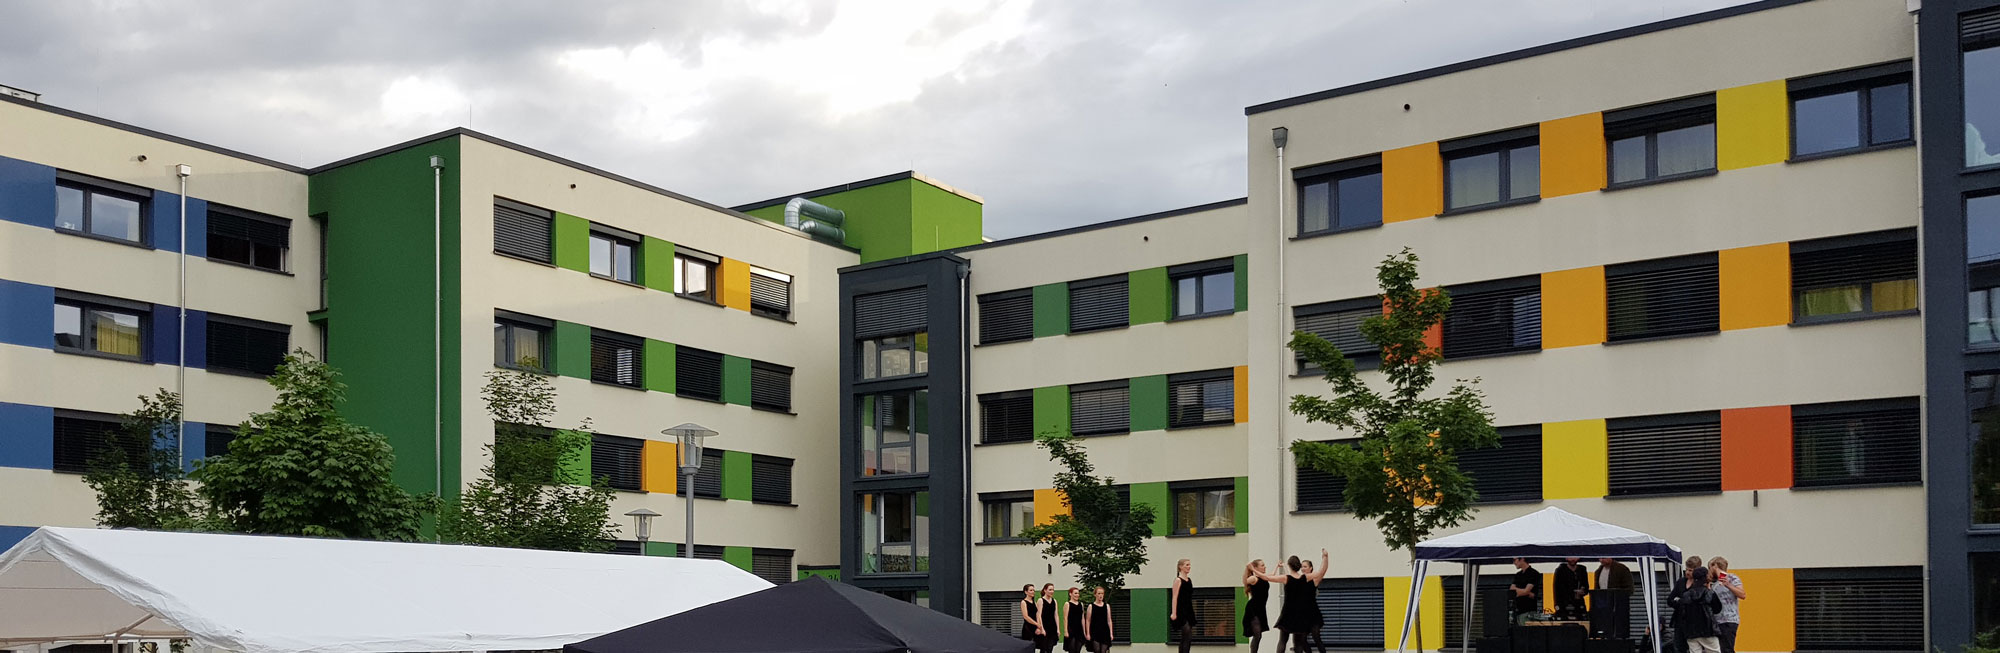 Studentenwohnheim Inter II